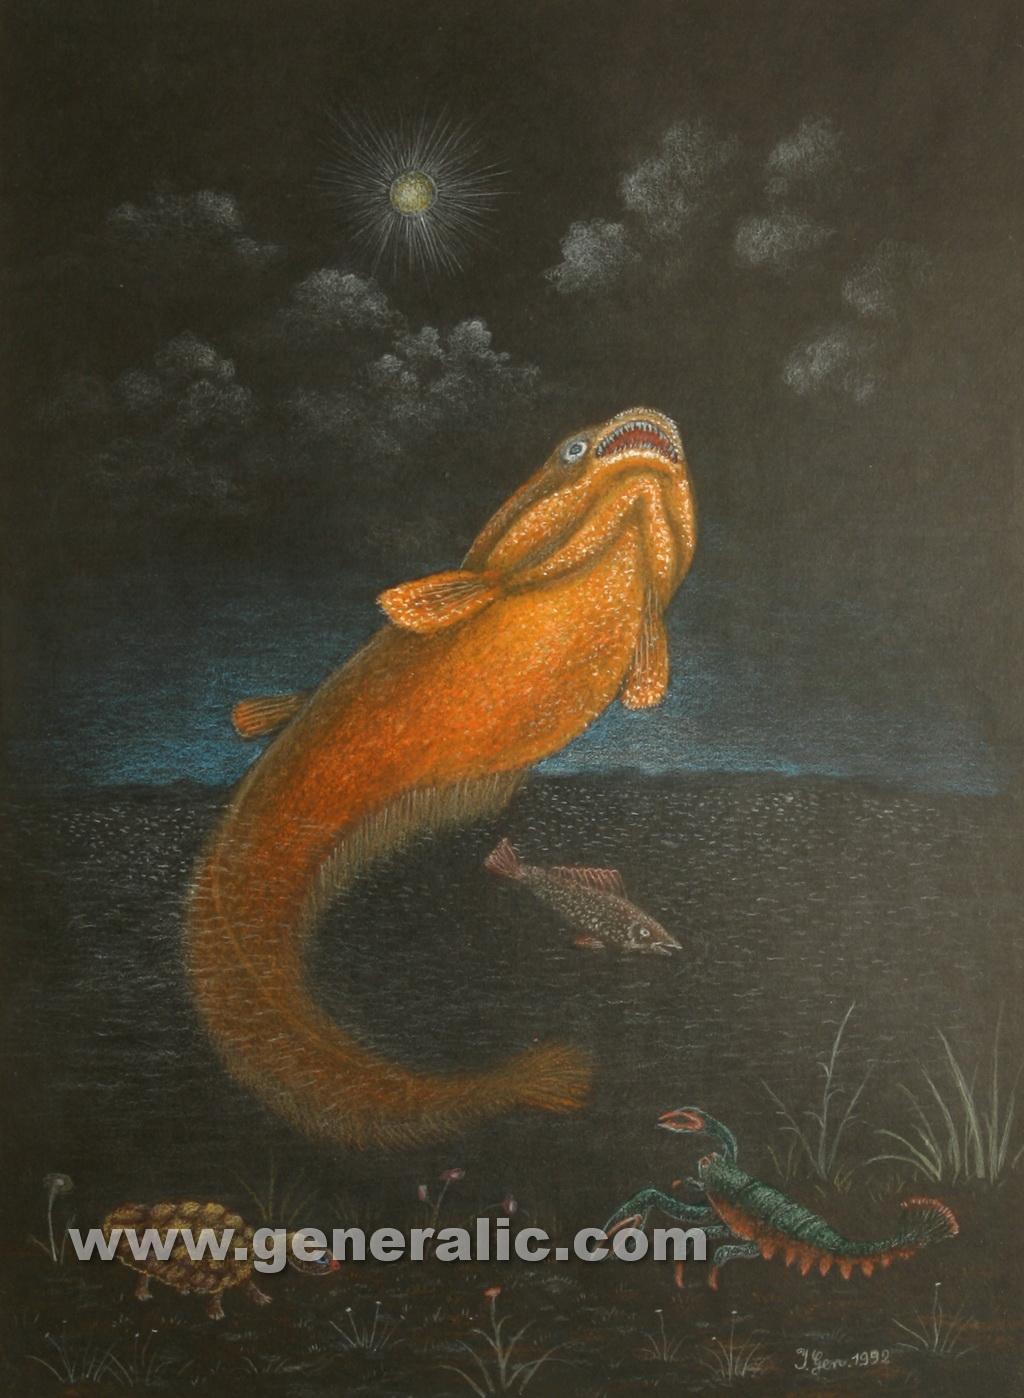 Ivan Generalic, 1992, Catfish, pastel, 50x36 cm